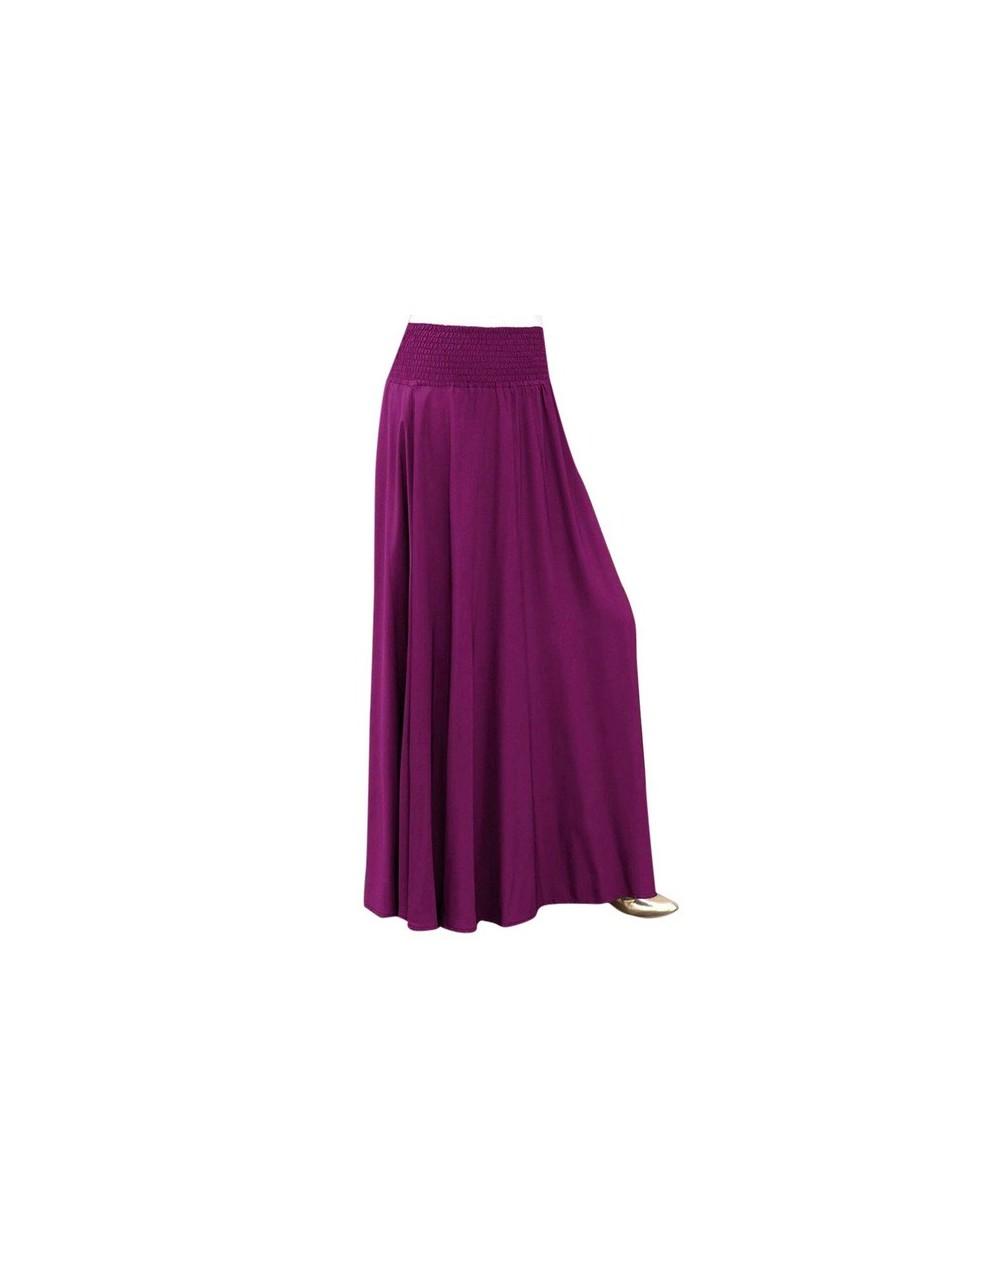 Women Fashion Elastic Waist Solid Color Cotton Pleated Skirt Vintage A-line Loose Casual Long Skirts Faldas Largas Autumn Ne...